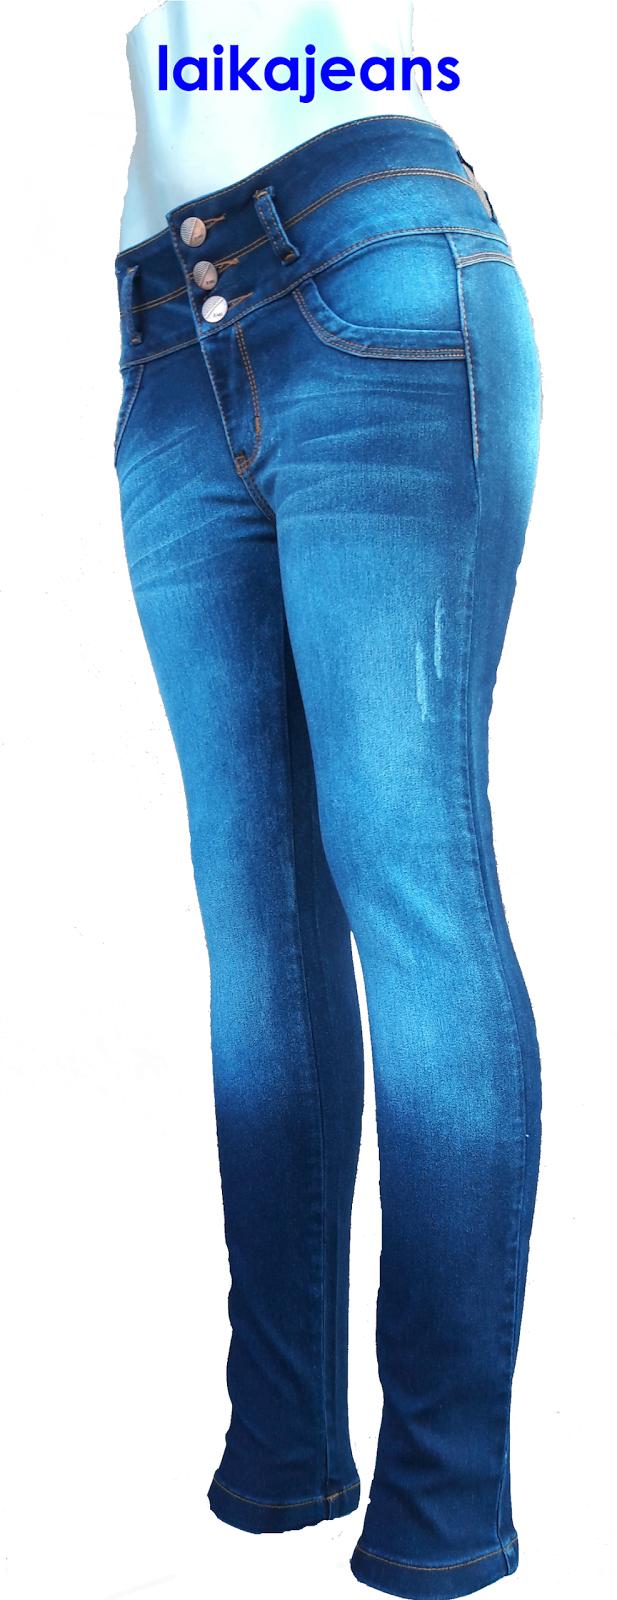 418c855da3 Pantalones levanta pompa Ninel conde Climax jeans de mayoreo baratos 2017